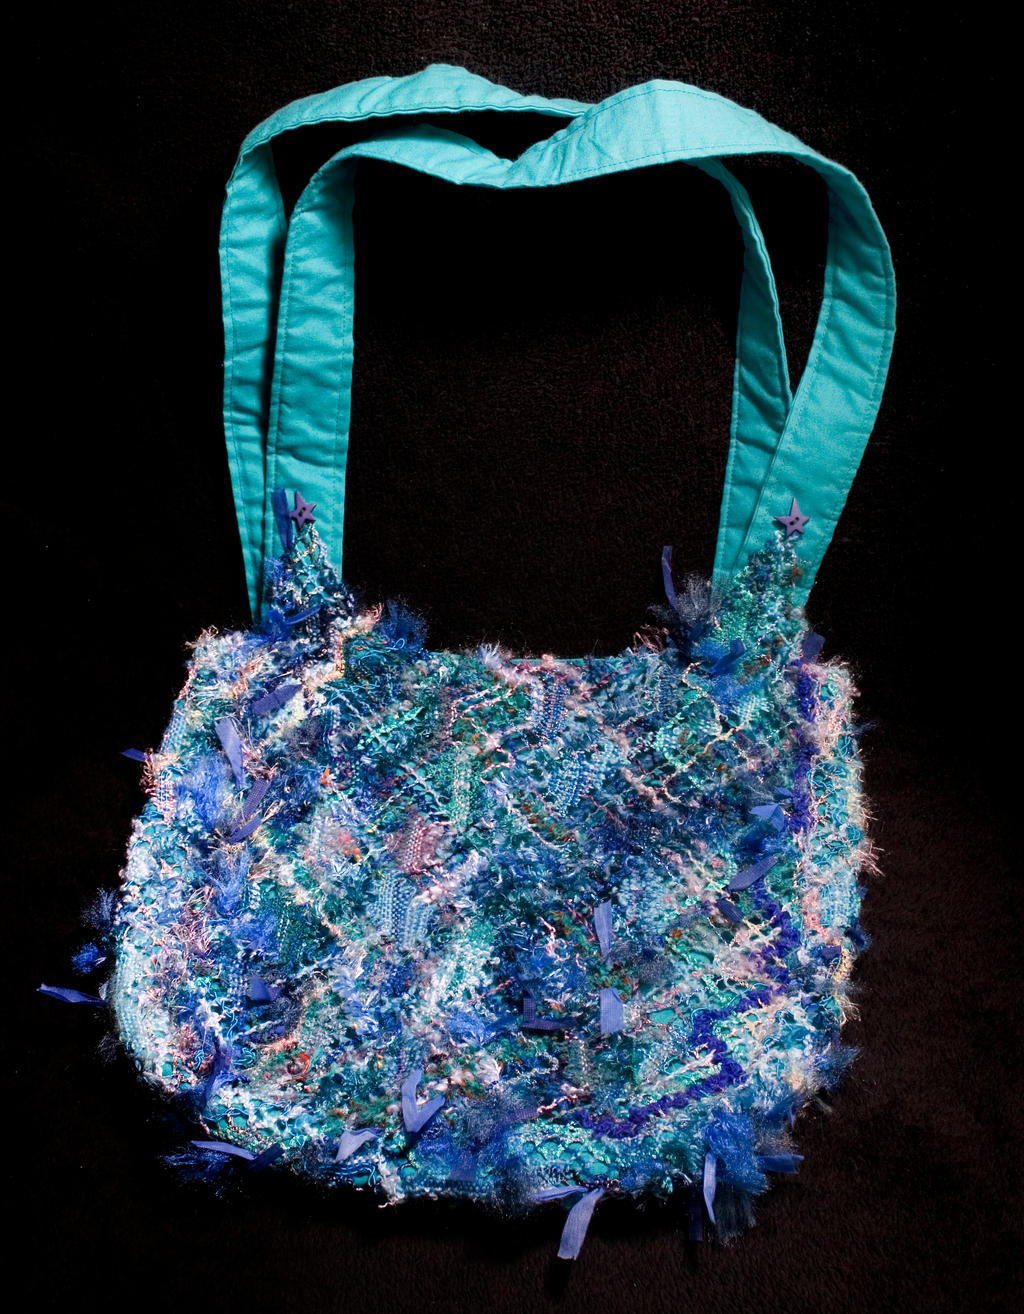 bobbin lace embellished bag 1 by averil-hylton